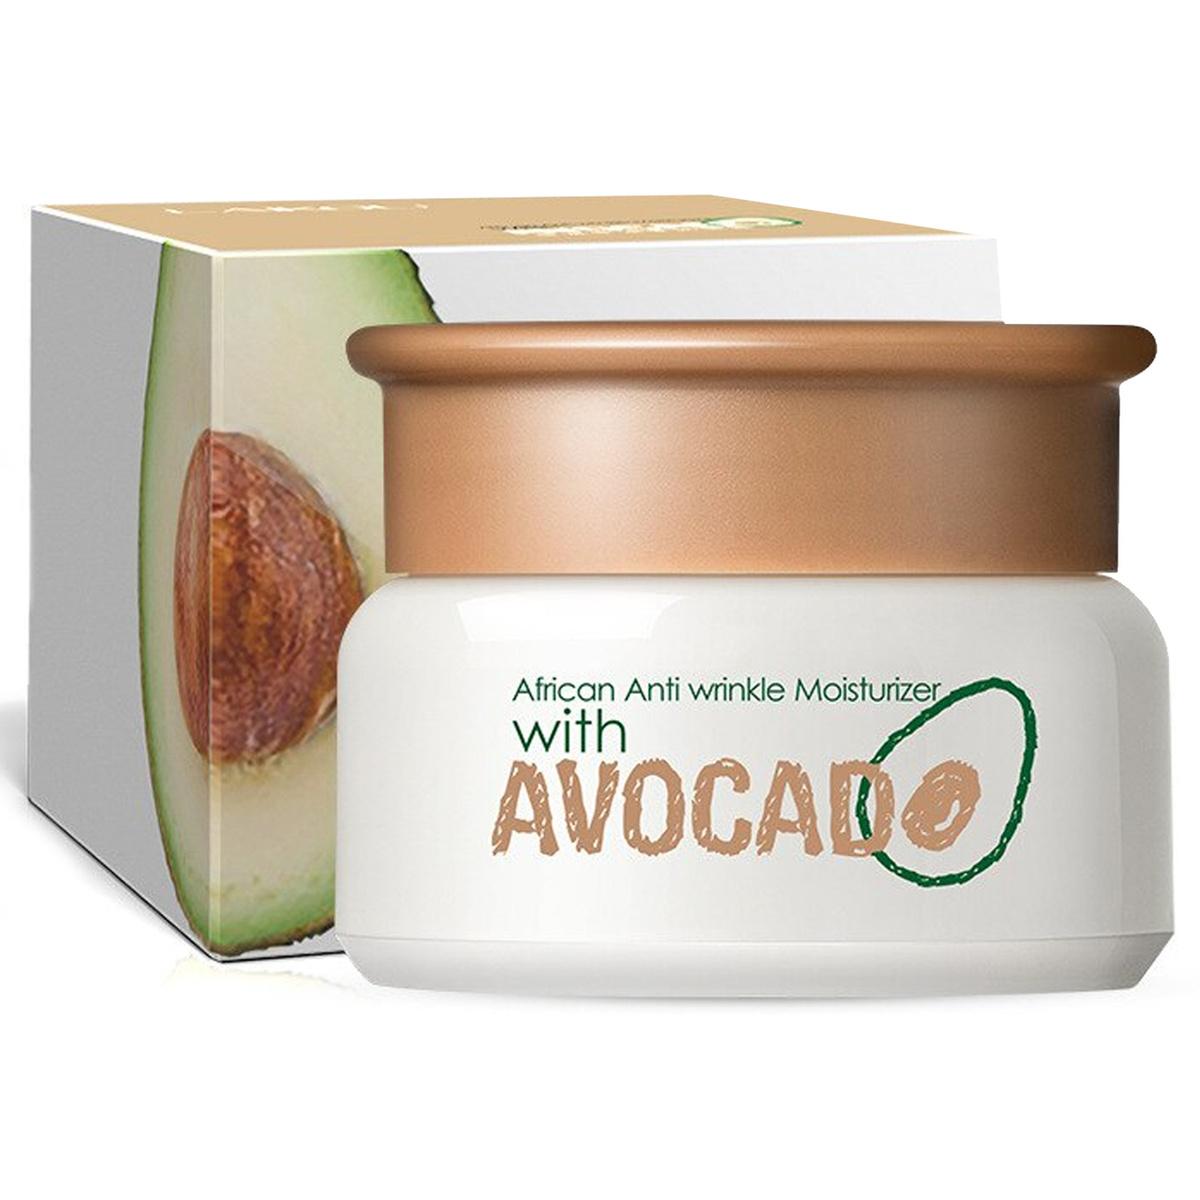 Laikou Увлажняющий крем против морщин с авокадо, 35гр. #1